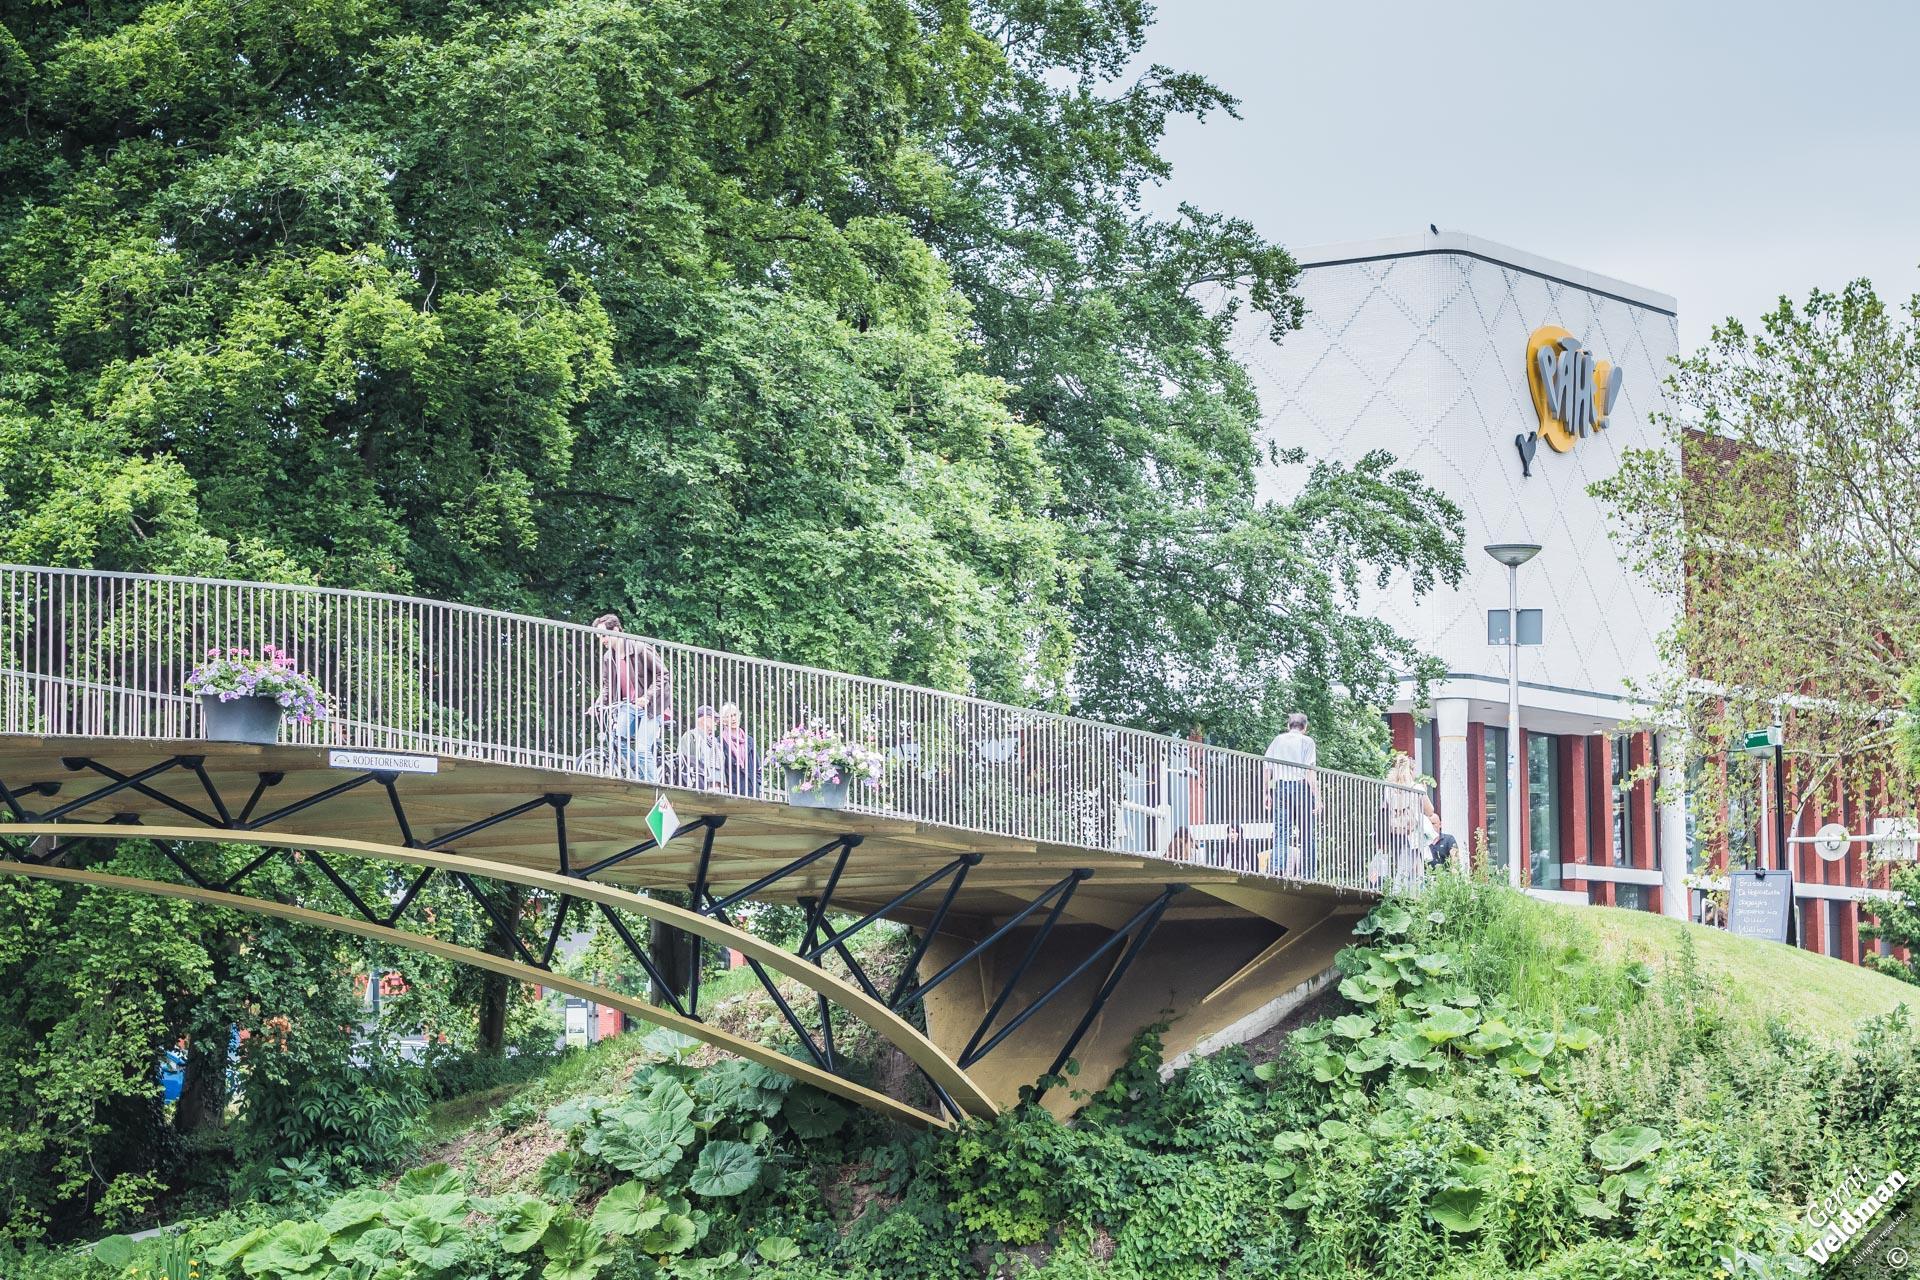 Rodetorenbrug, Zwolle